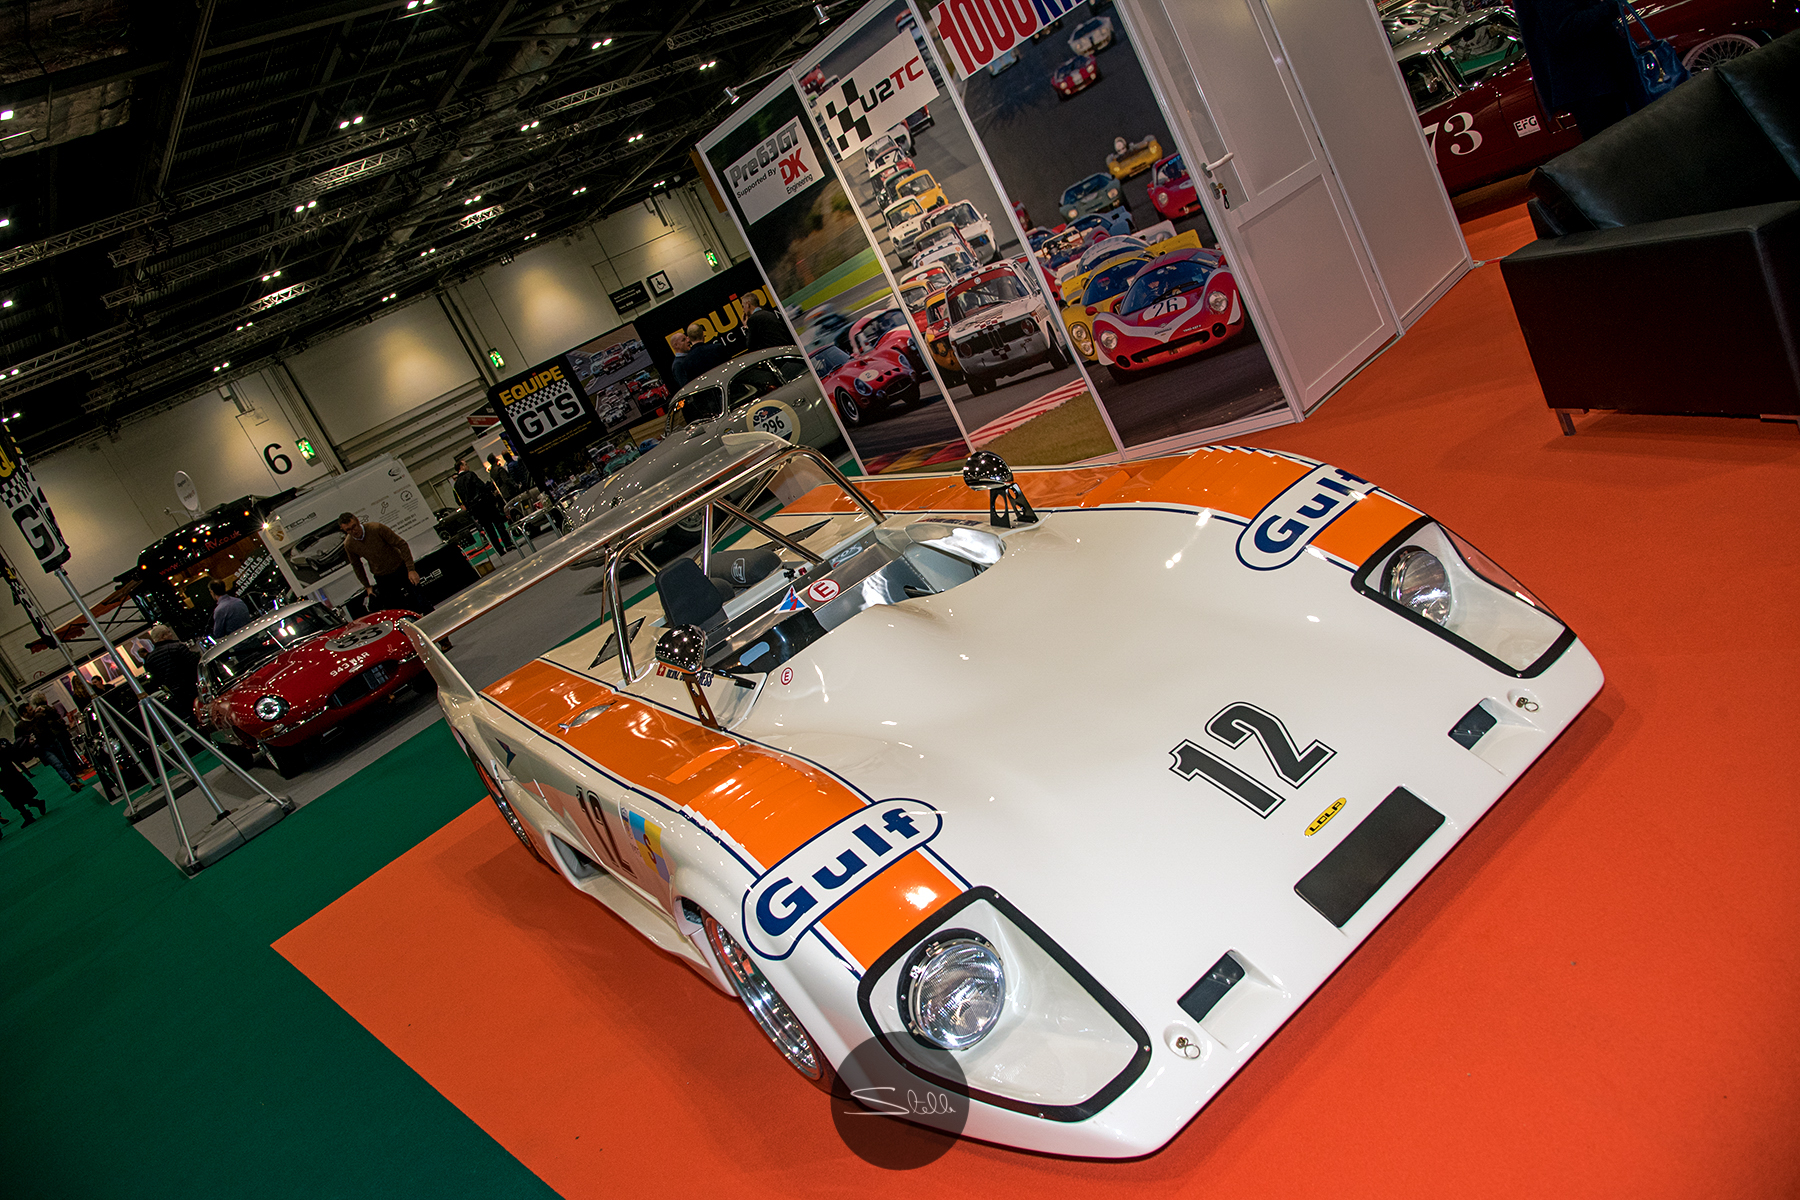 Stella Scordellis London Classic Car Show 2018 17 Watermarked.jpg